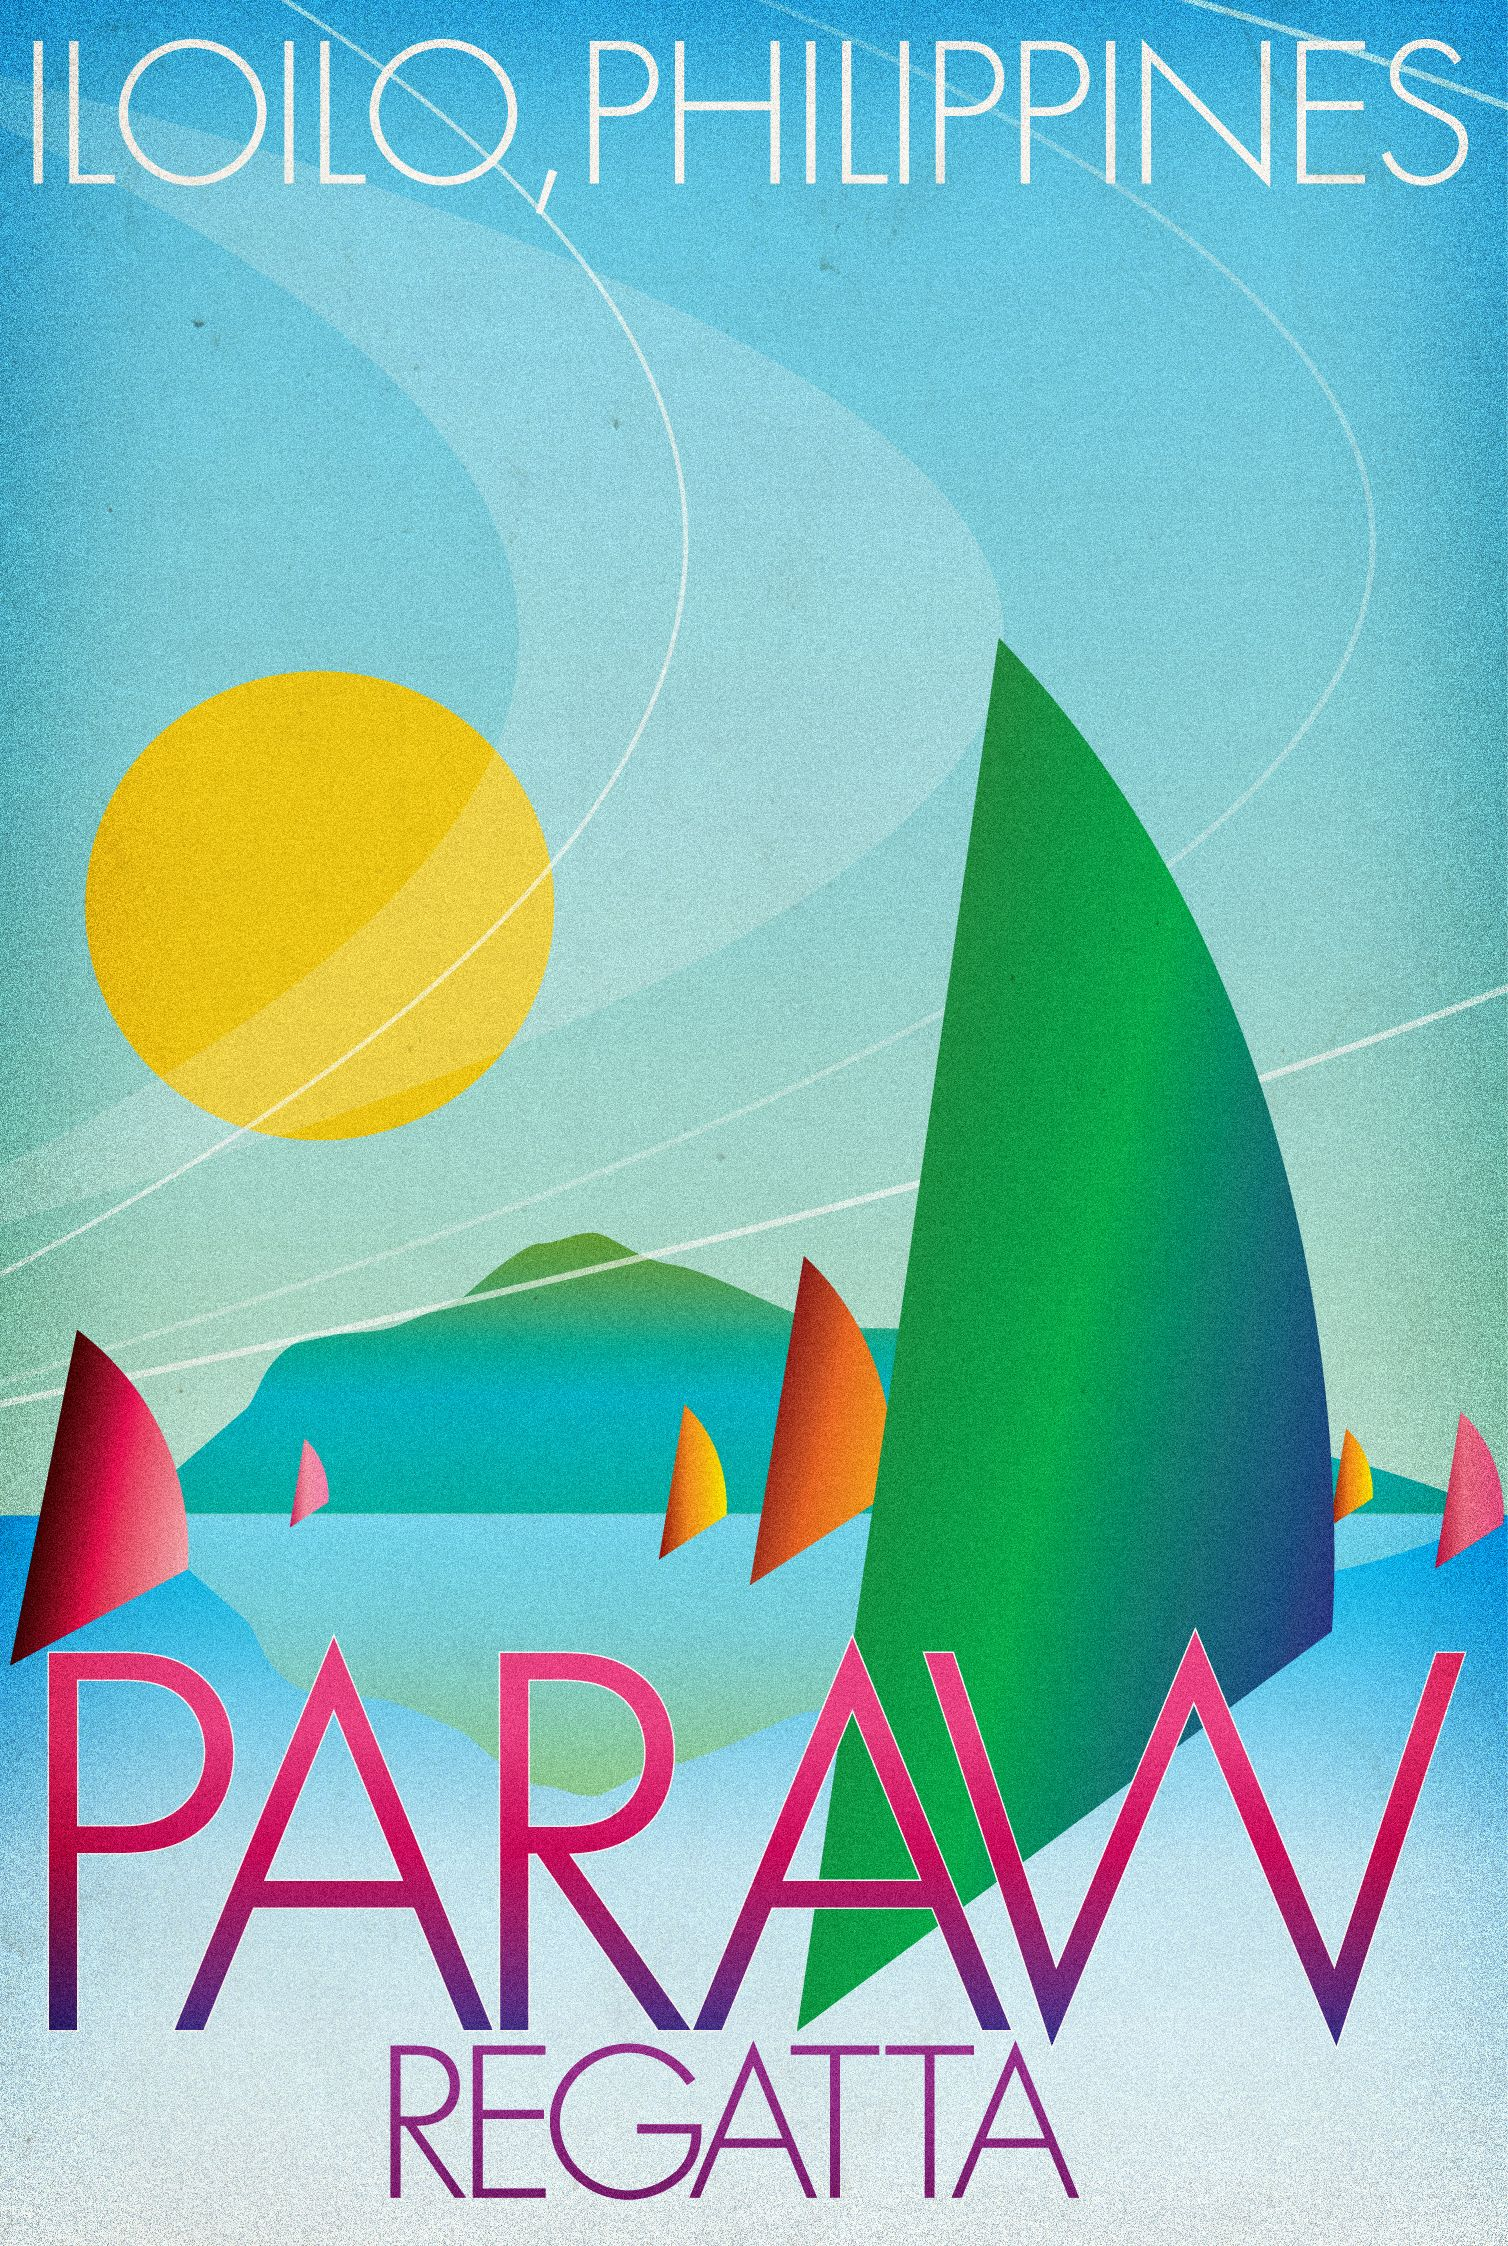 Paraw Regatta, IloIlo Philippines travel, Travel